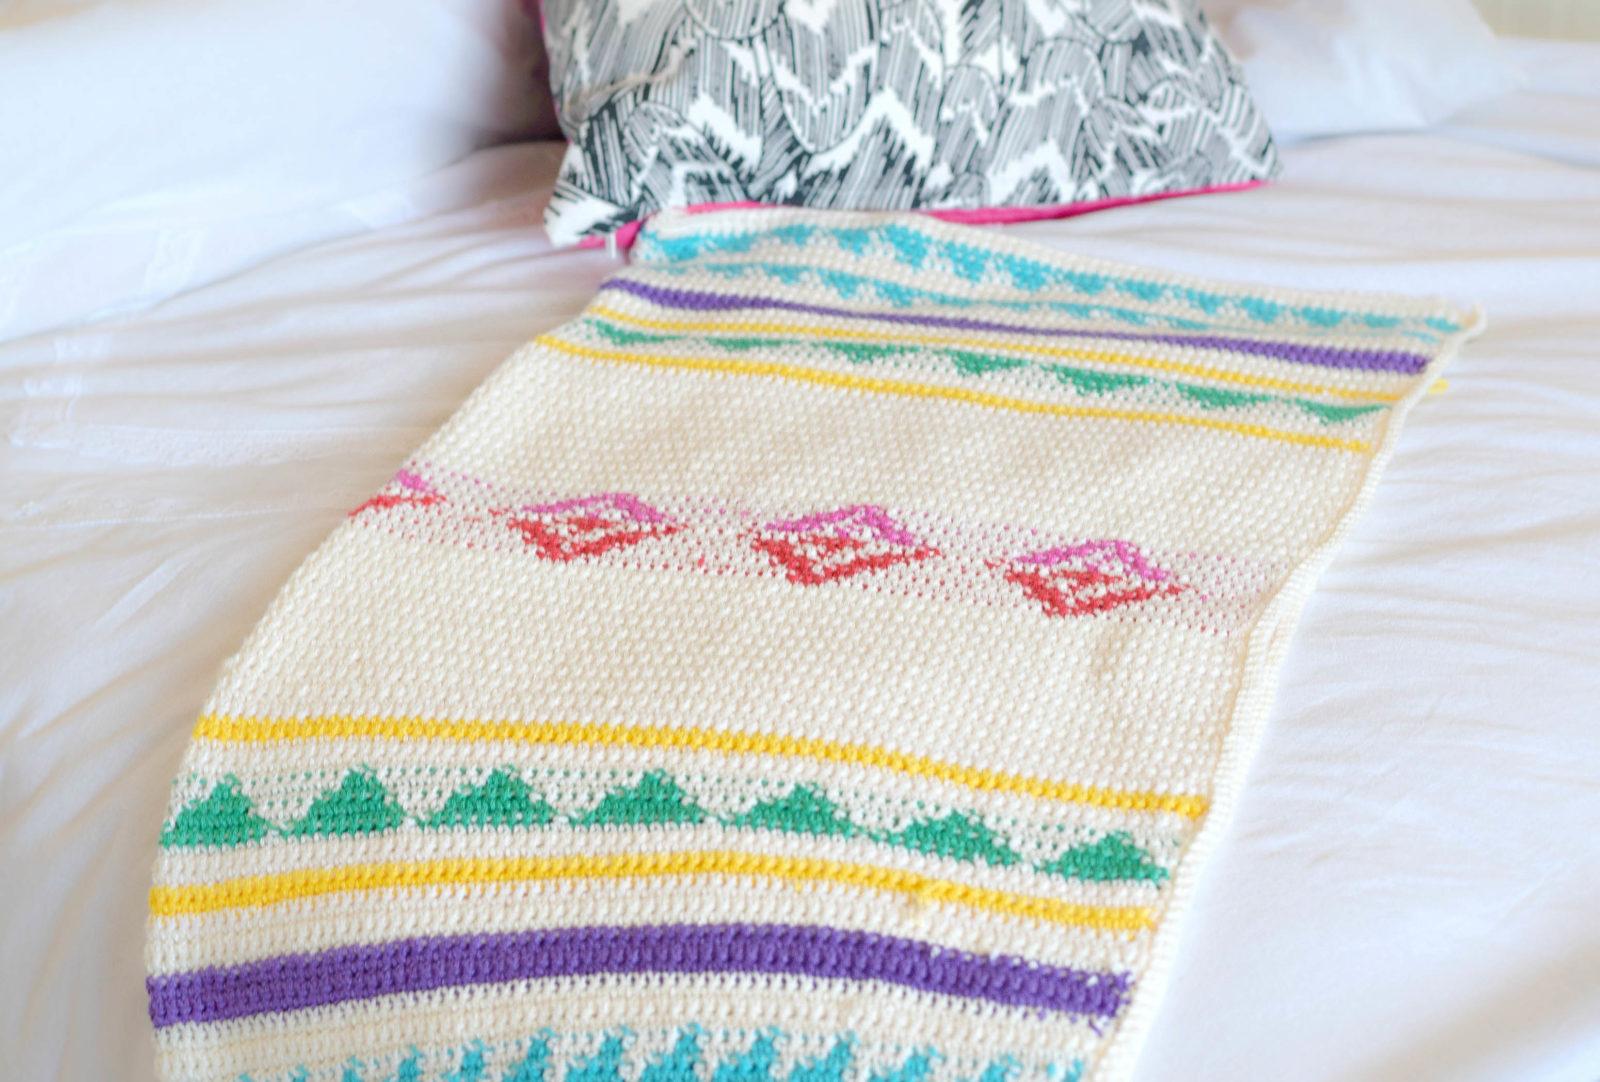 modern camp crochet blanket pattern – mama in a stitch - campy crochet blanket pattern free southwest